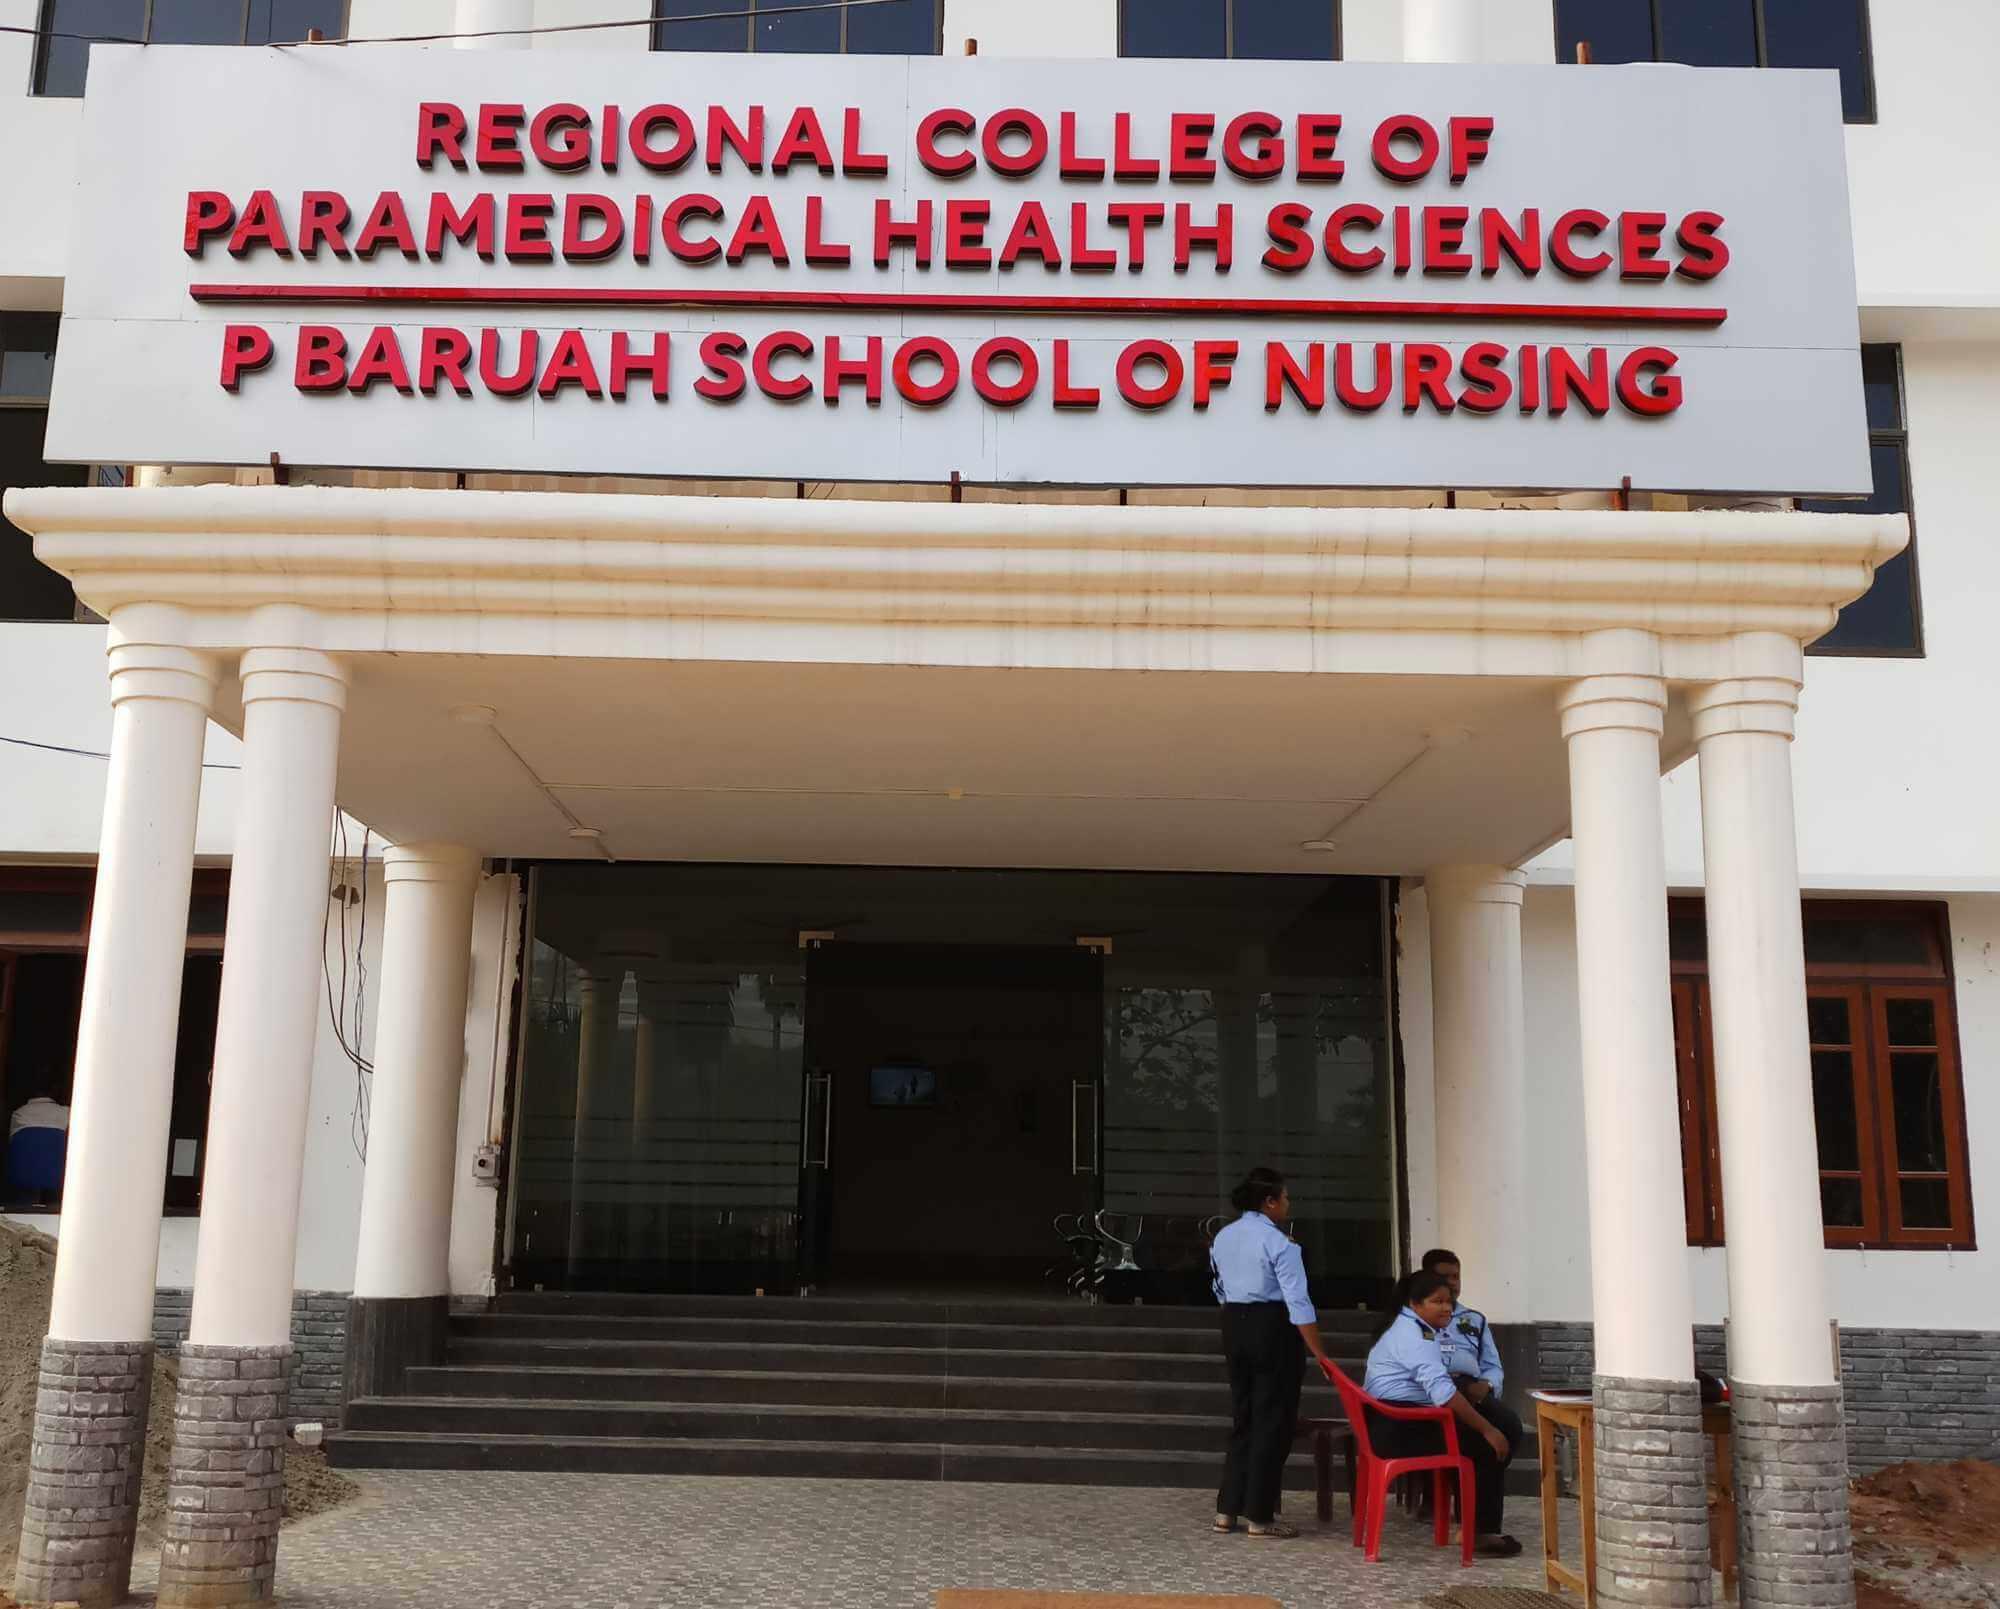 regional-college-of-paramedical-health-sciences